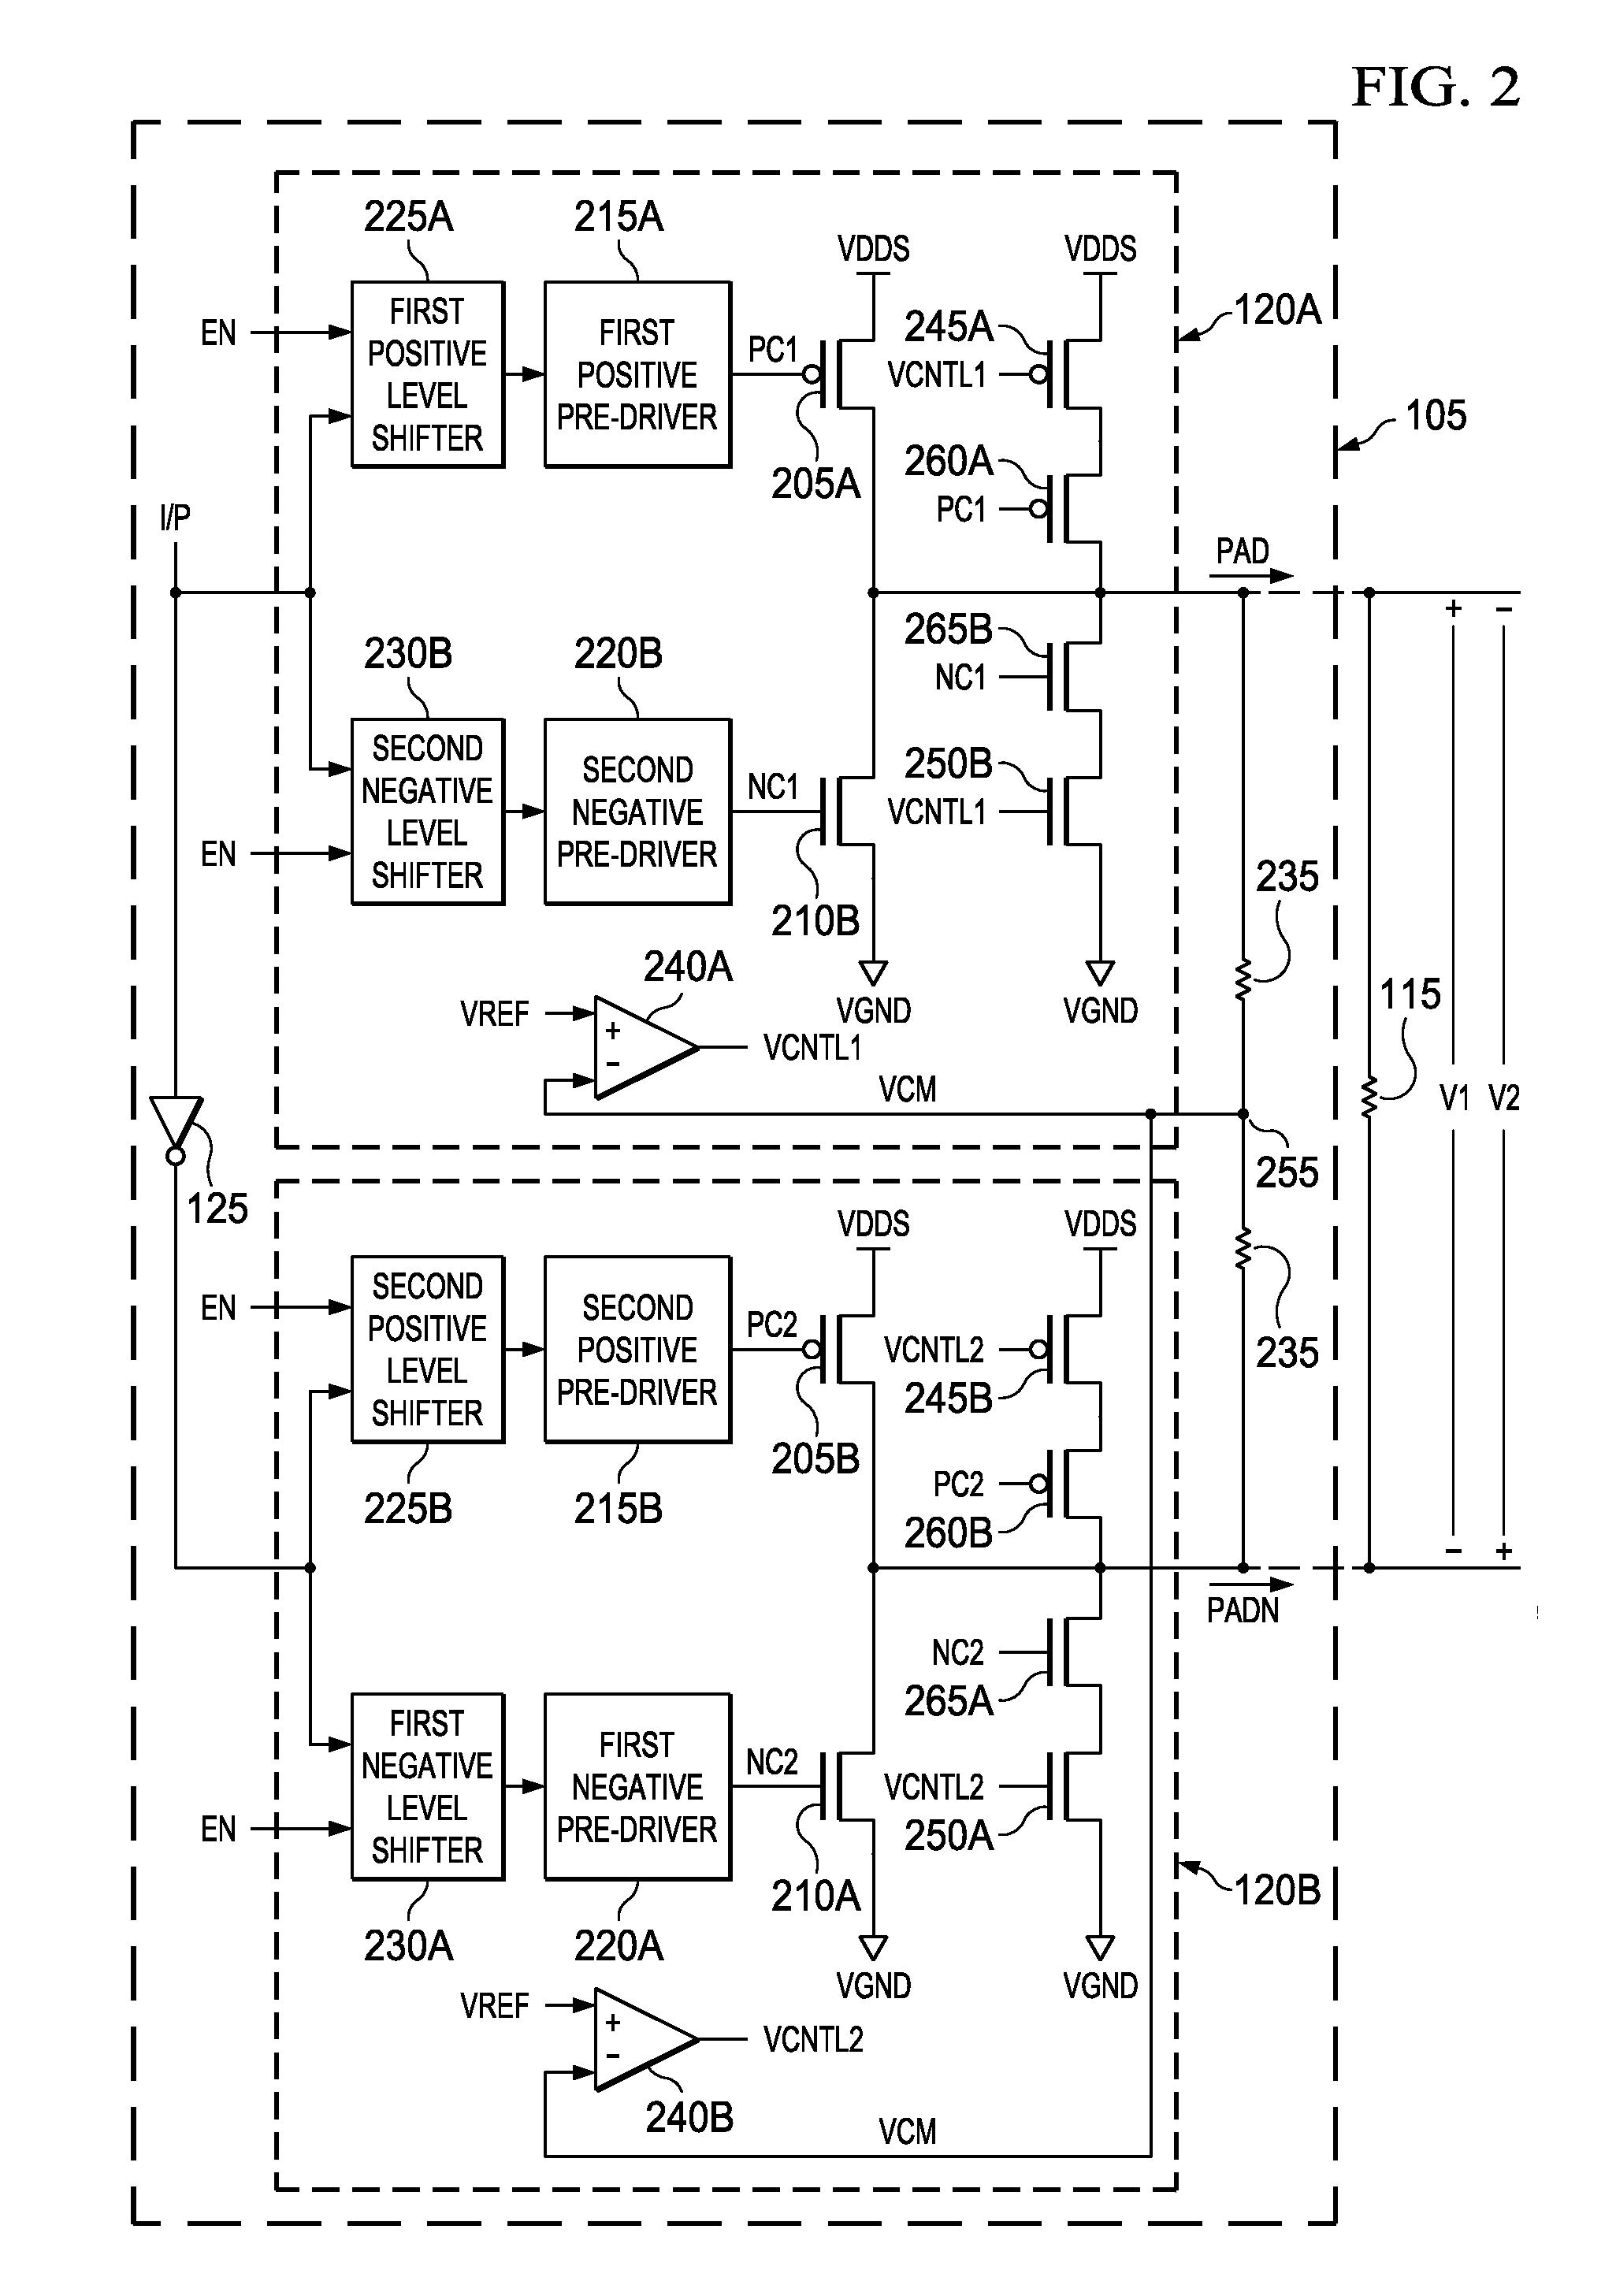 bus low voltage differential signaling (blvds) circuit